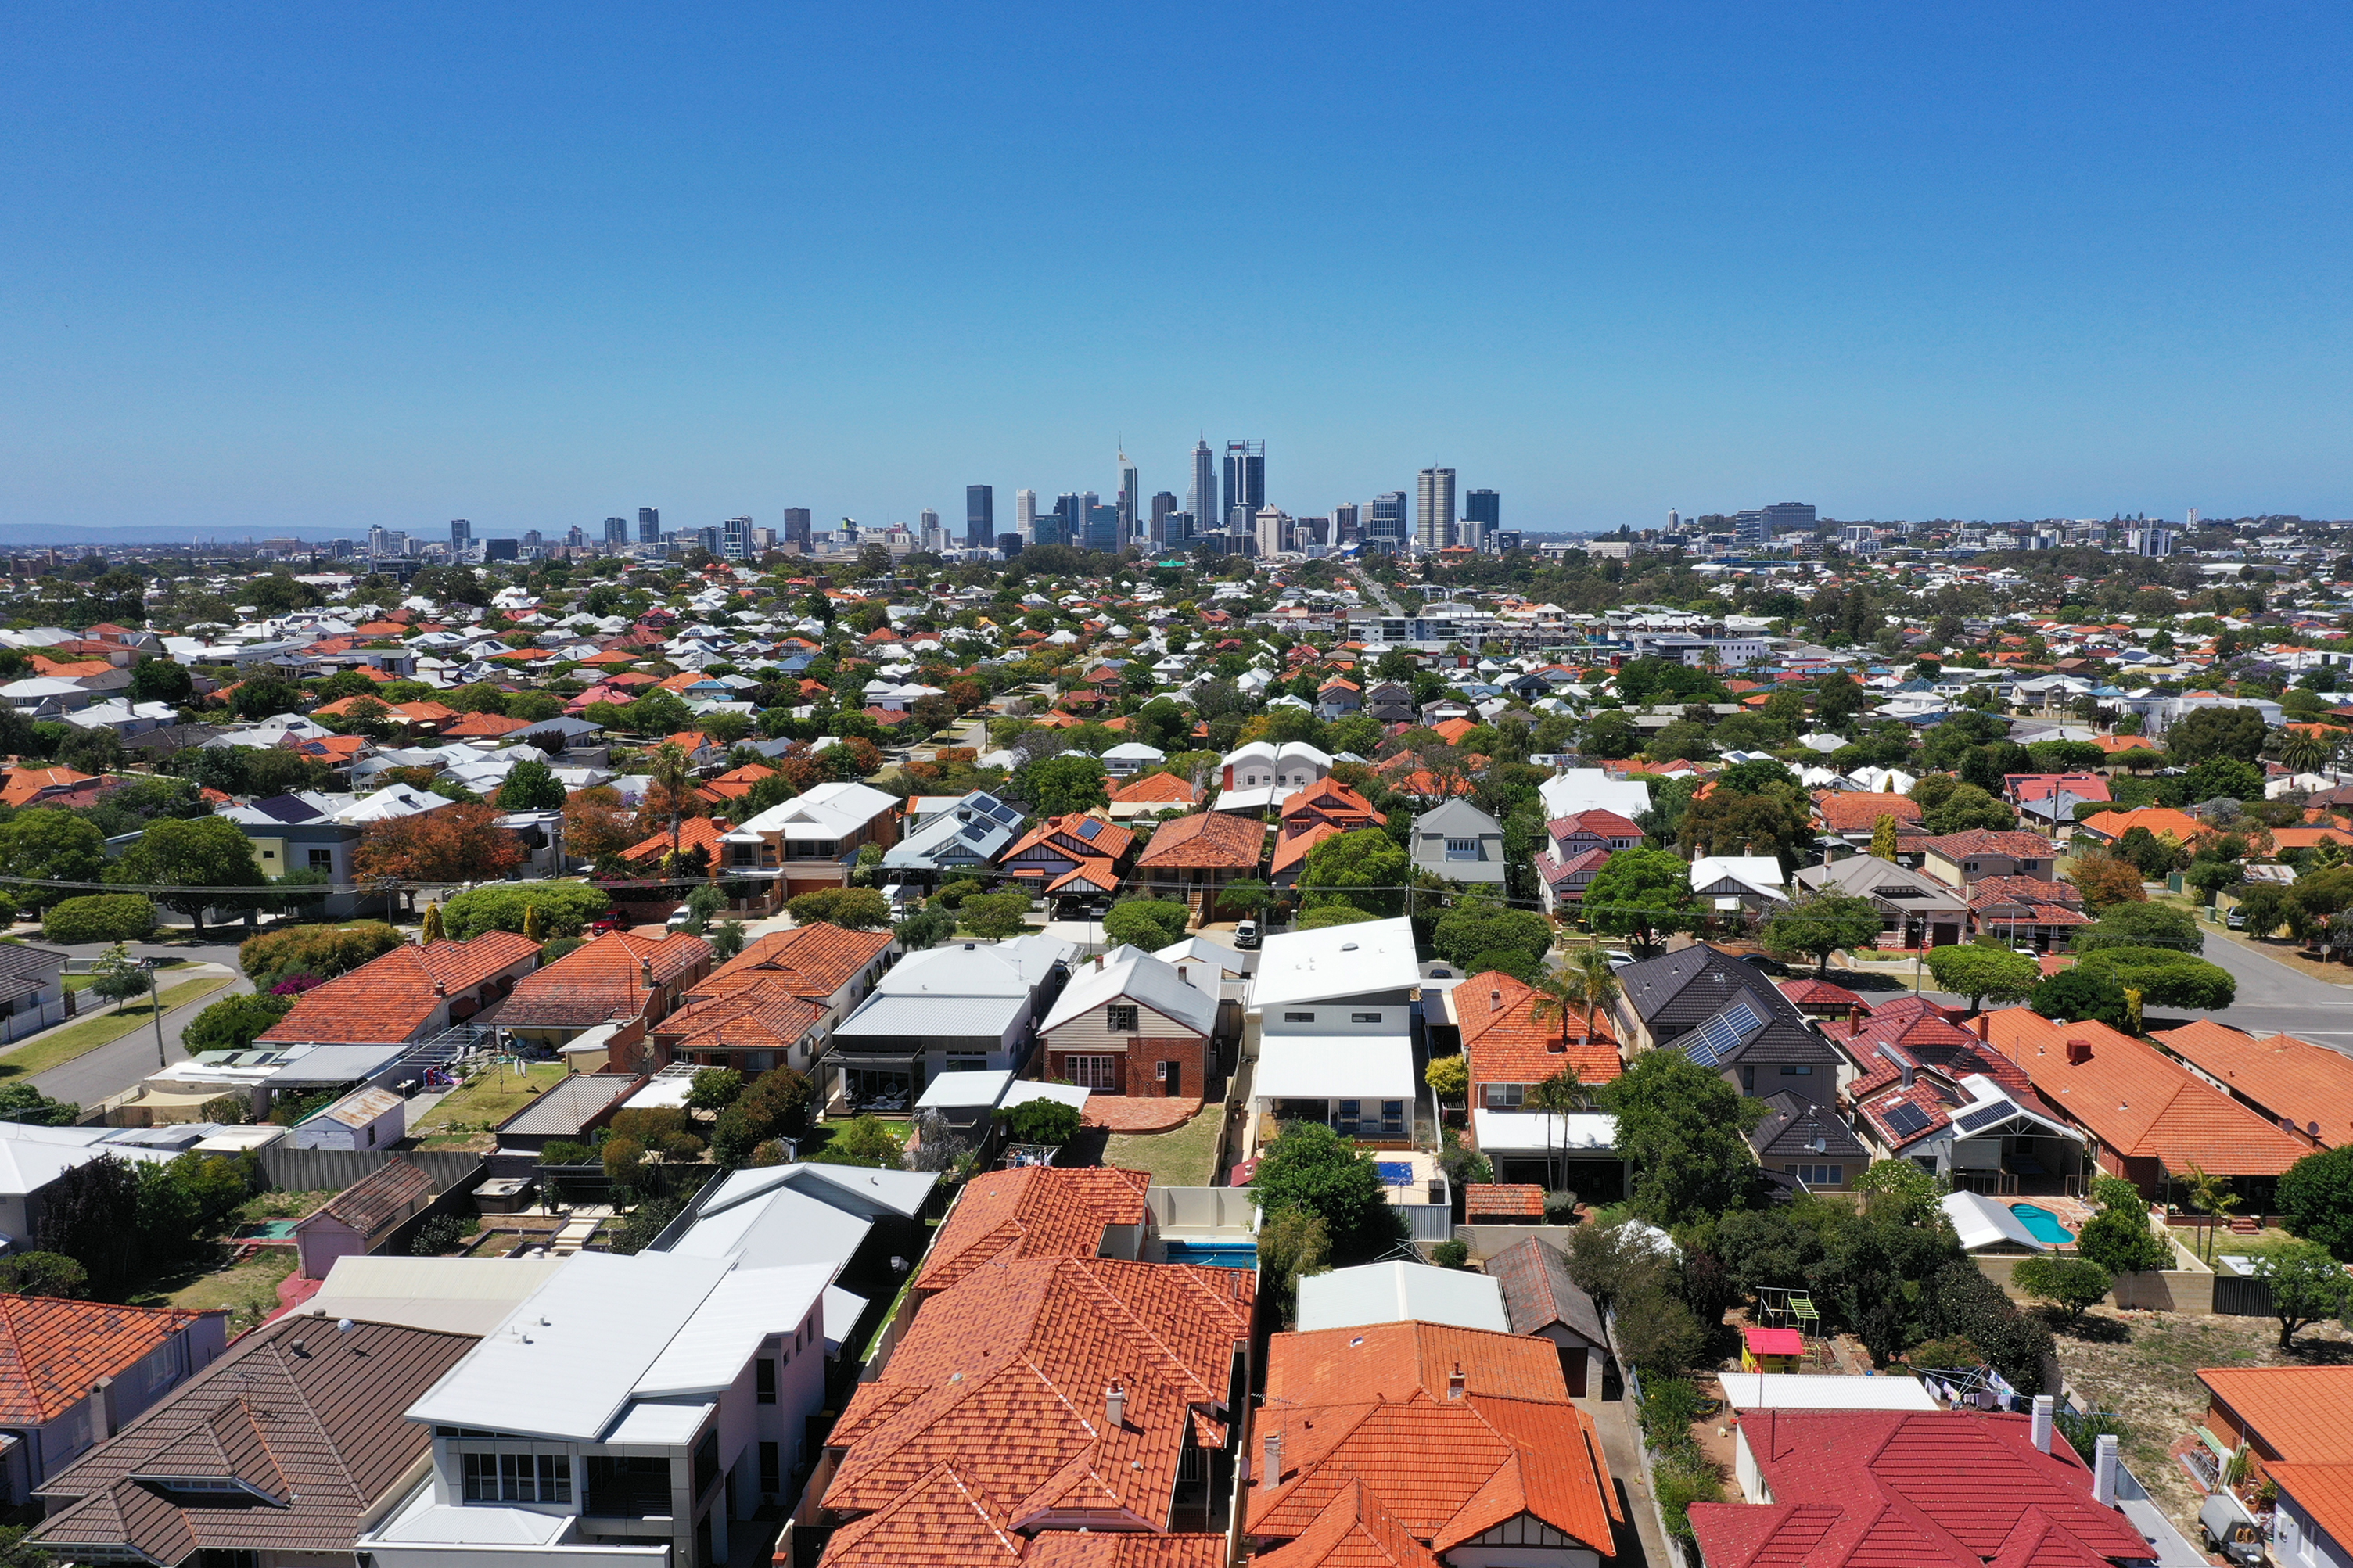 Australian Suburban Housing